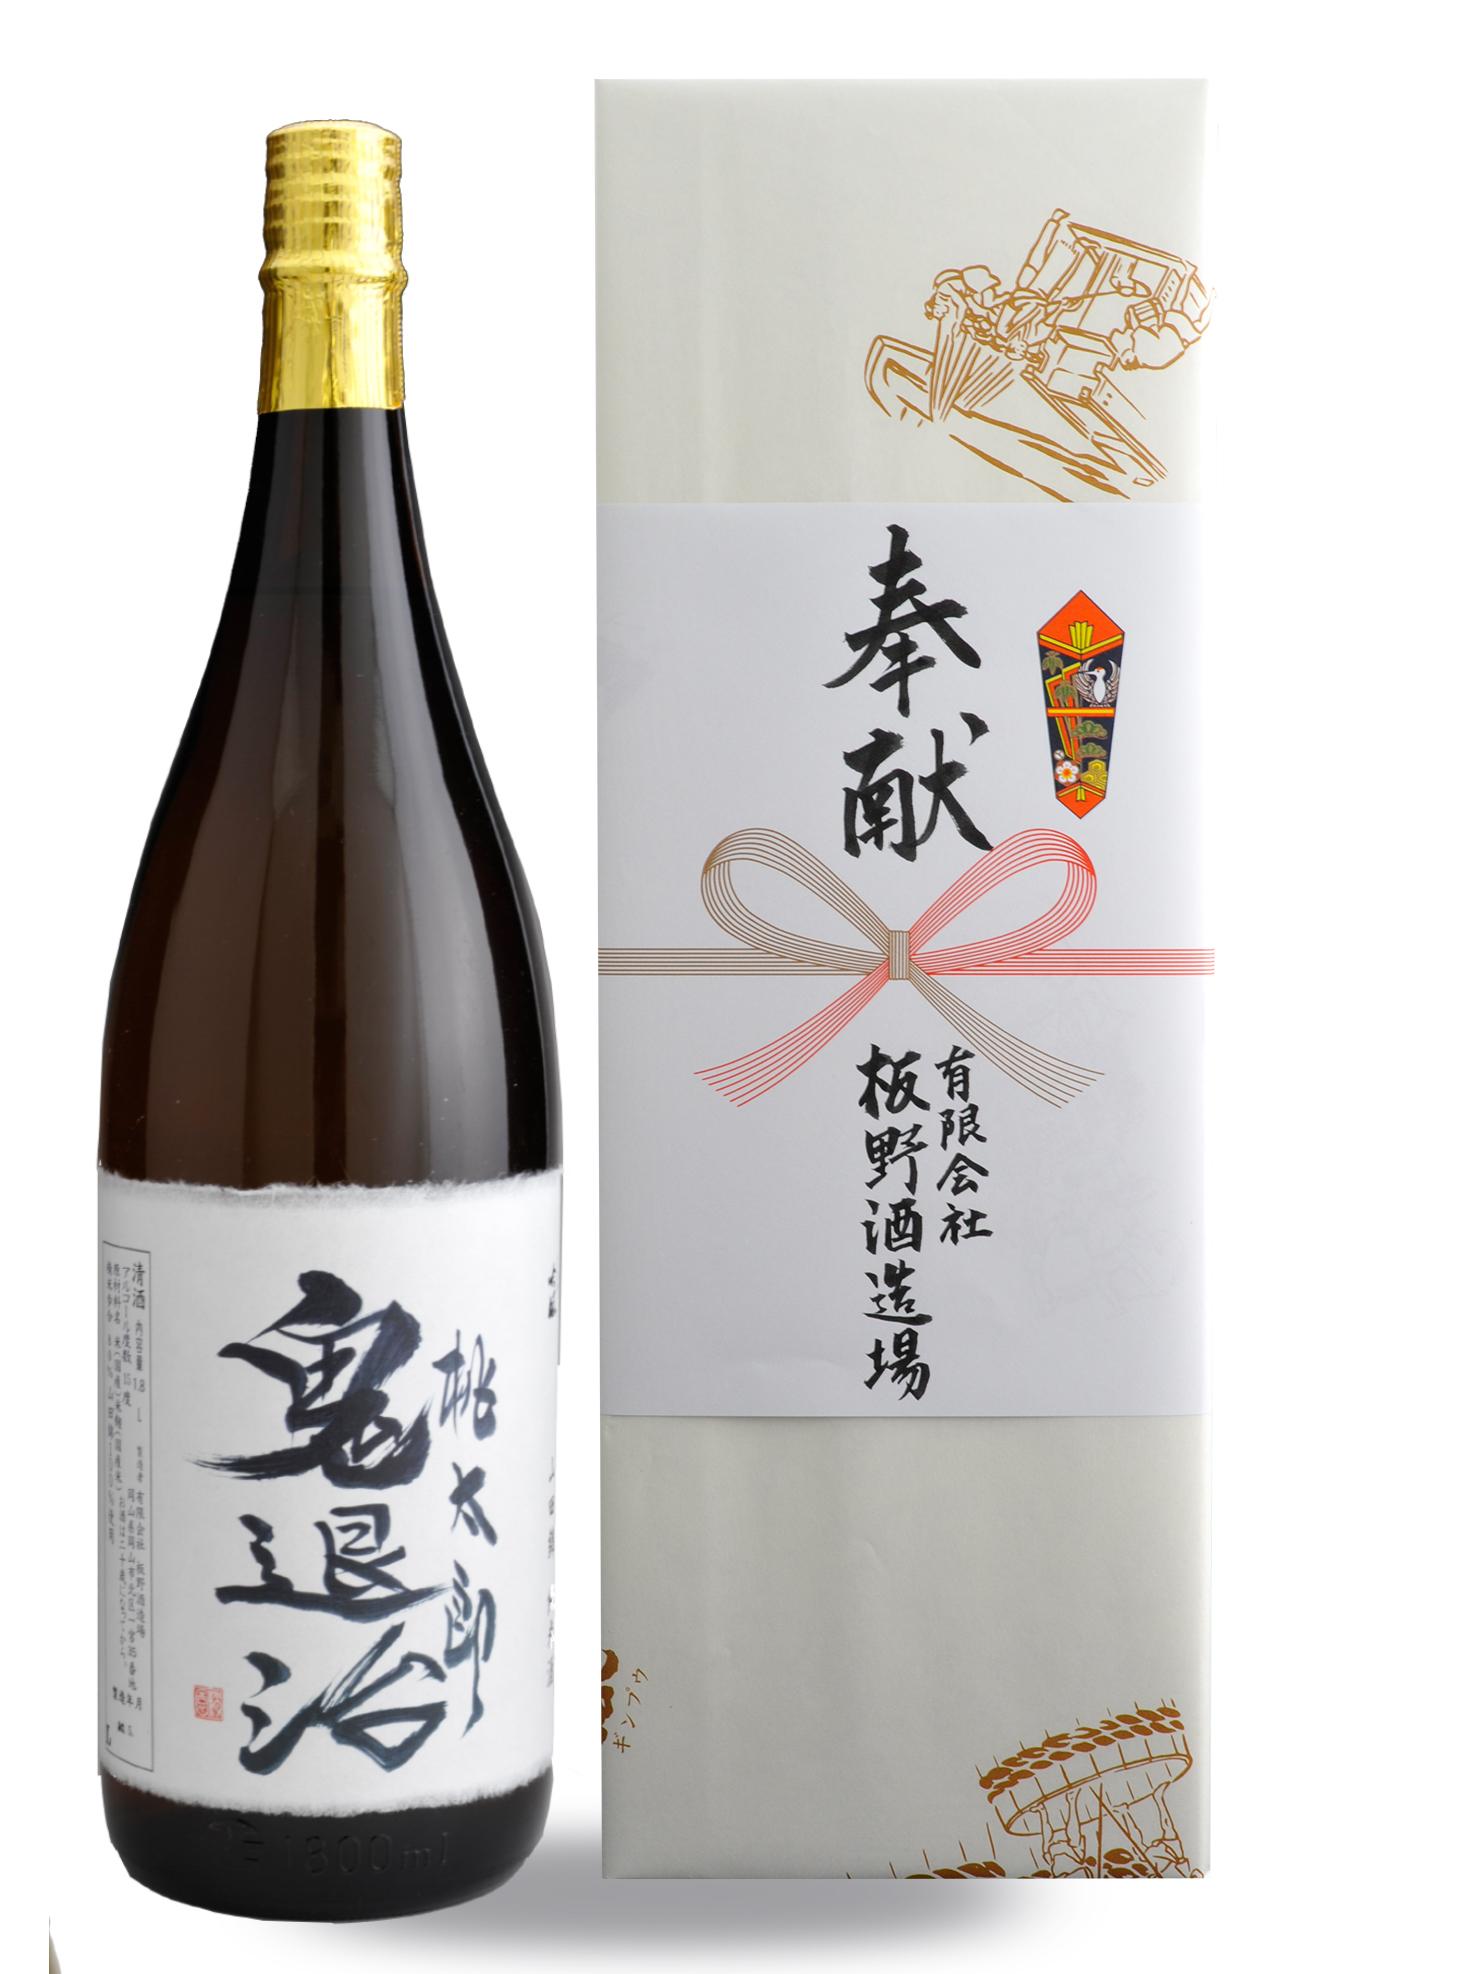 桃太郎鬼退治プリント熨斗 板野酒造場